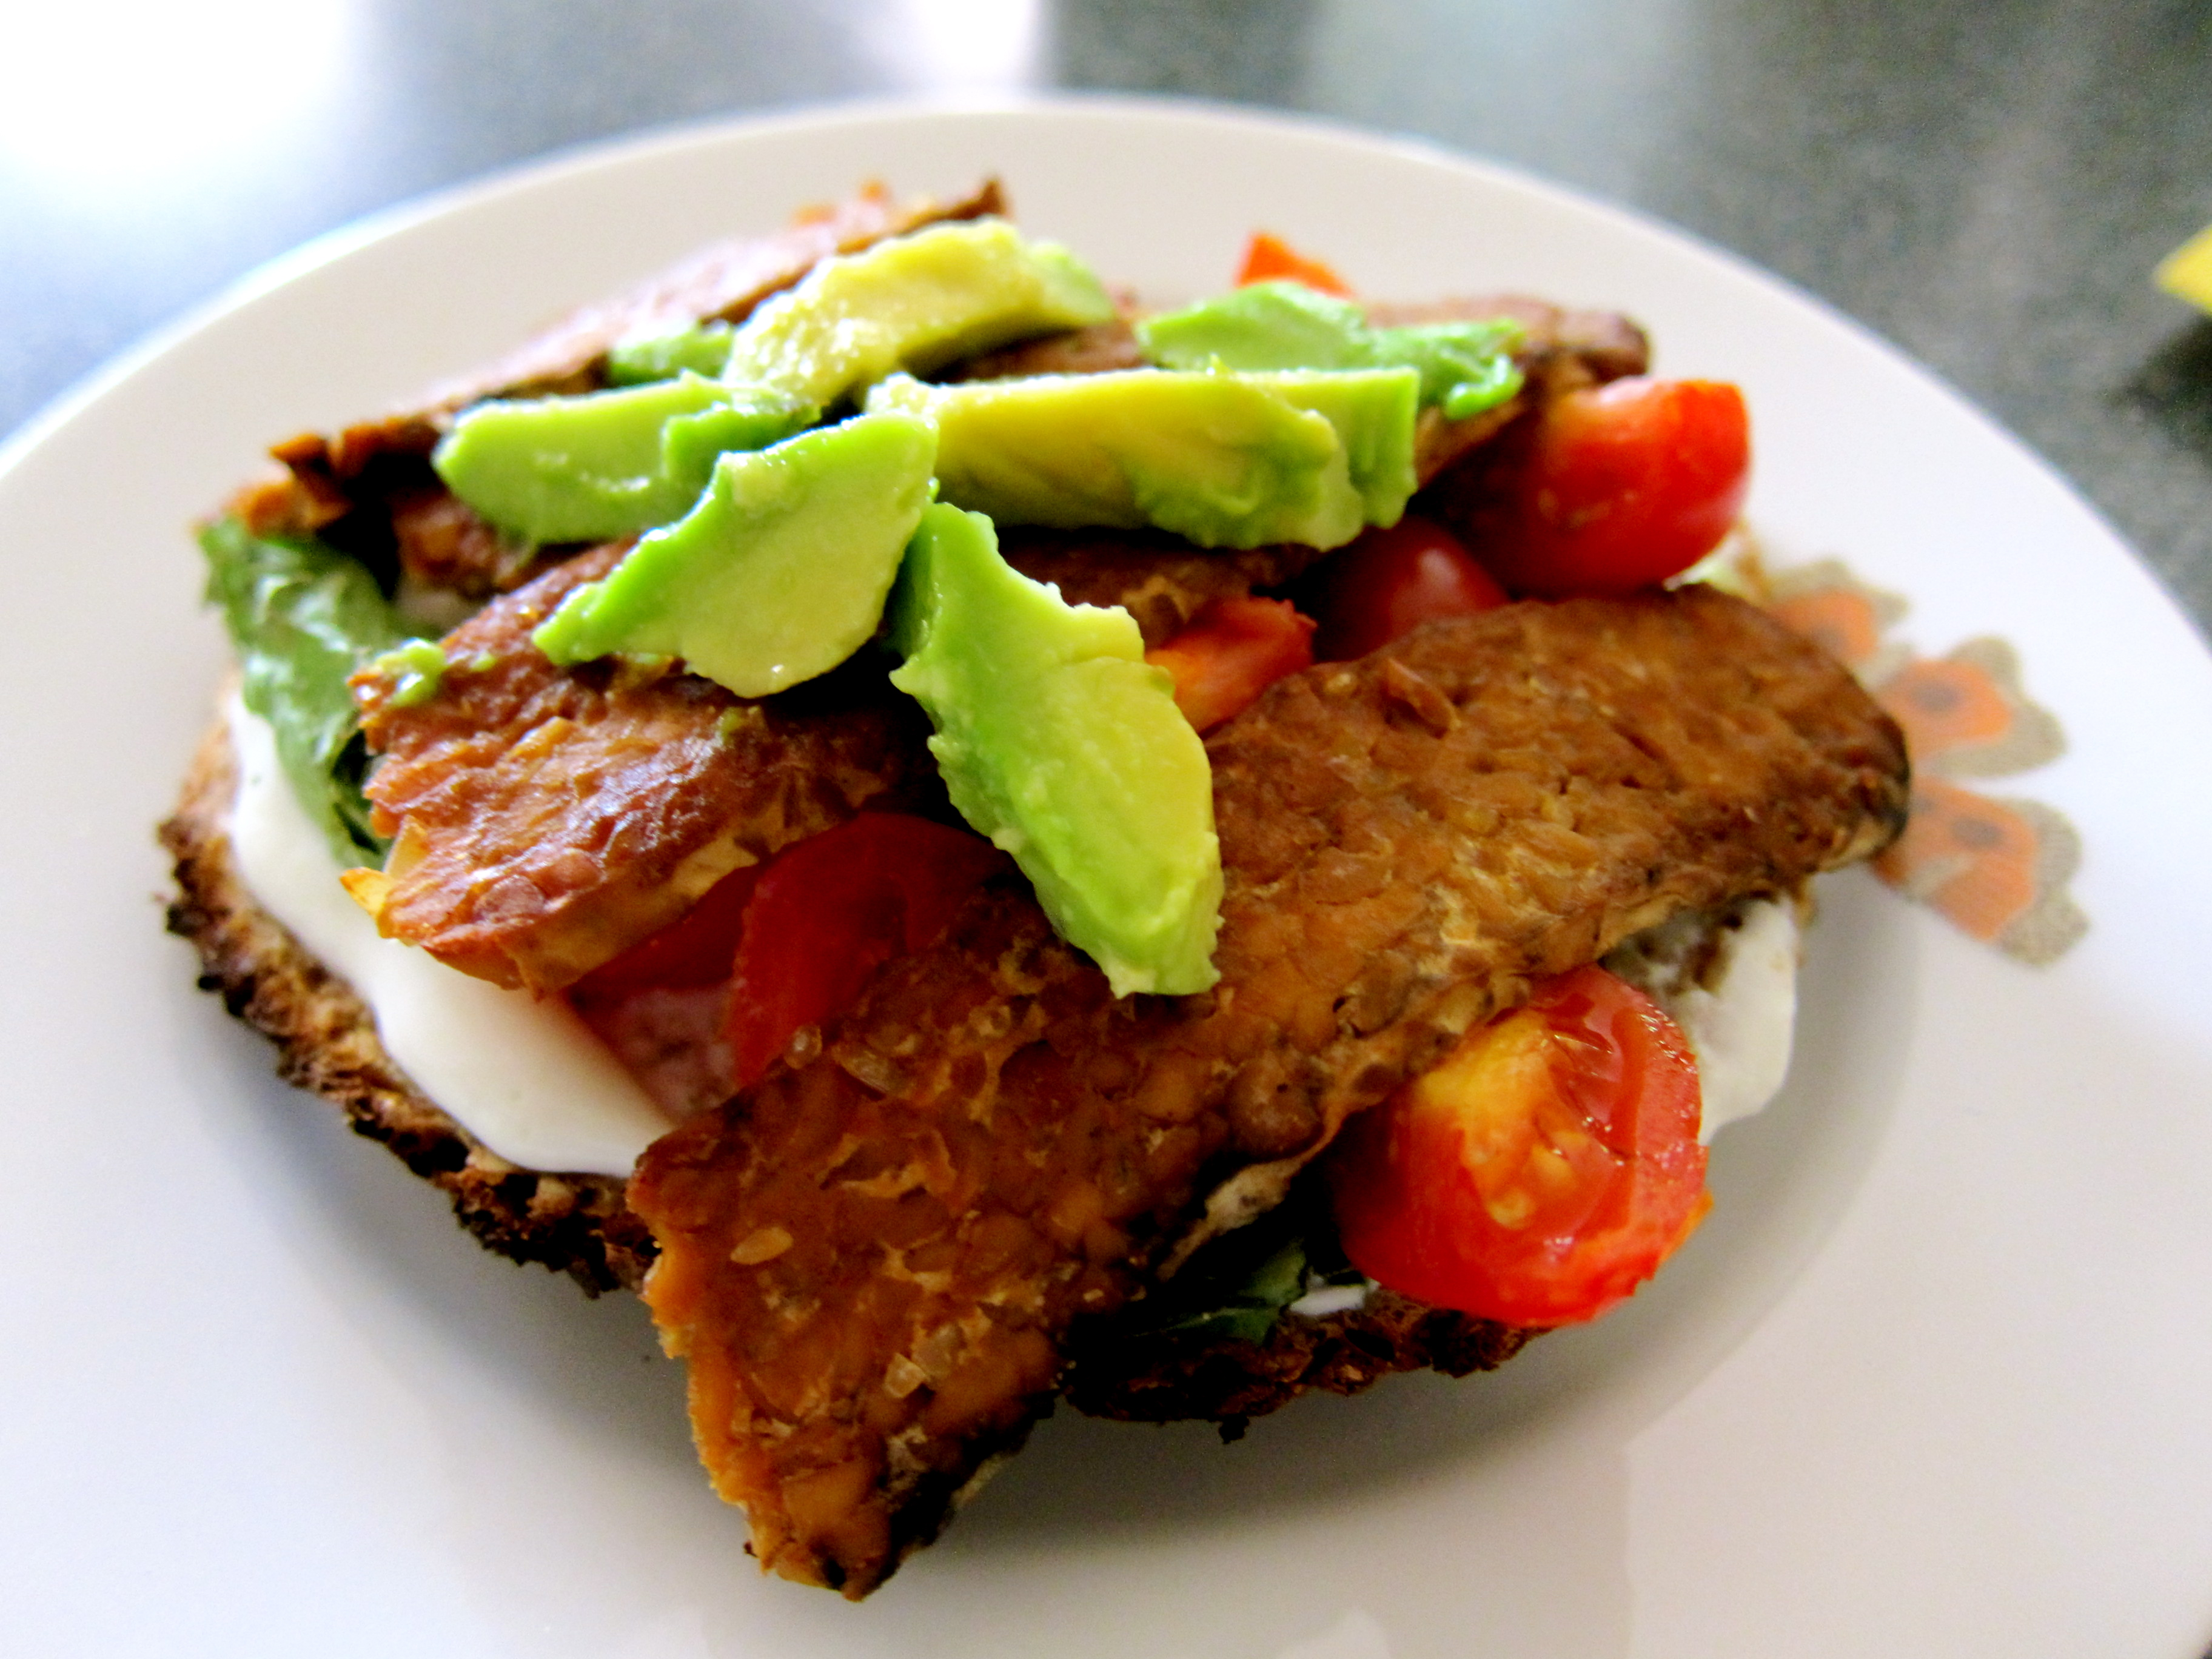 Lunch Meat Alternative